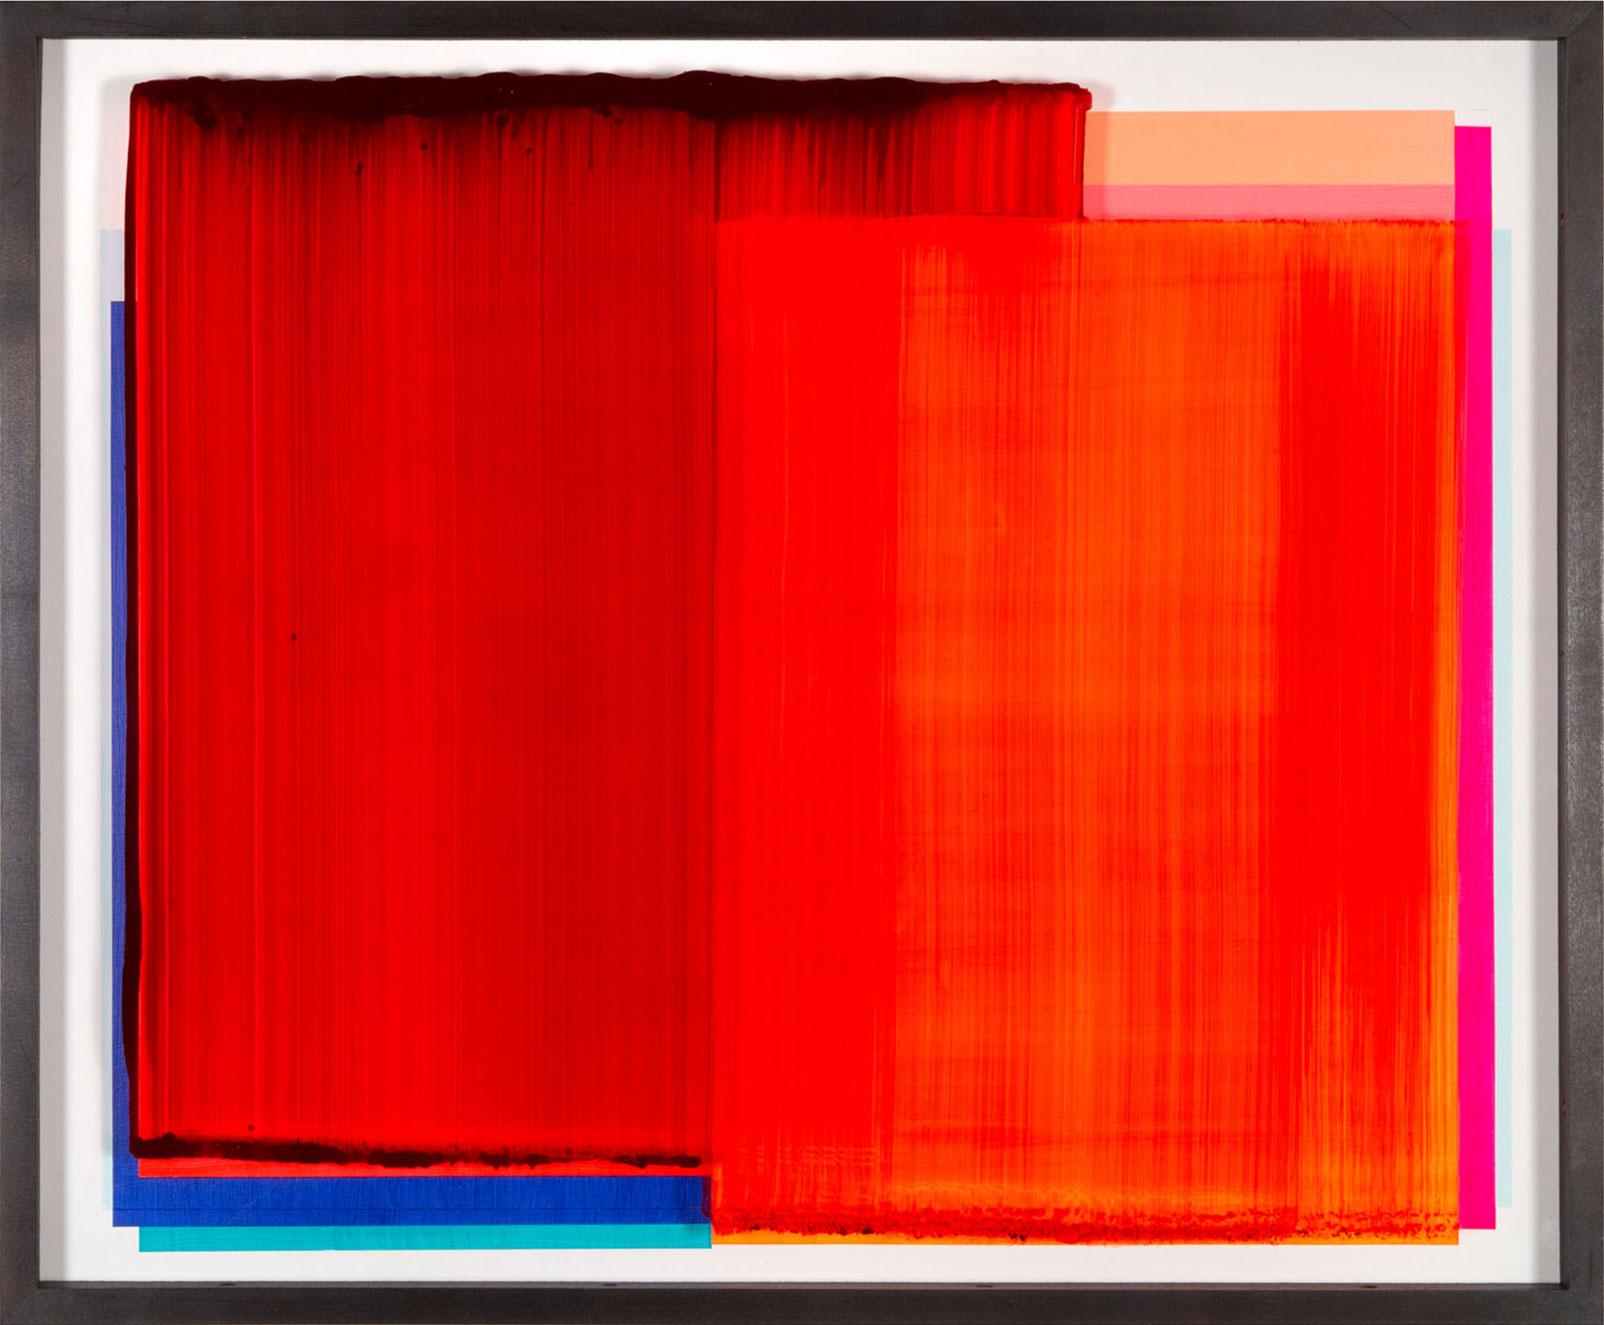 """Work Piece"" 2020; 70 x 85 cm acrylic behind glass, acrylic and chrome varnish on wood"